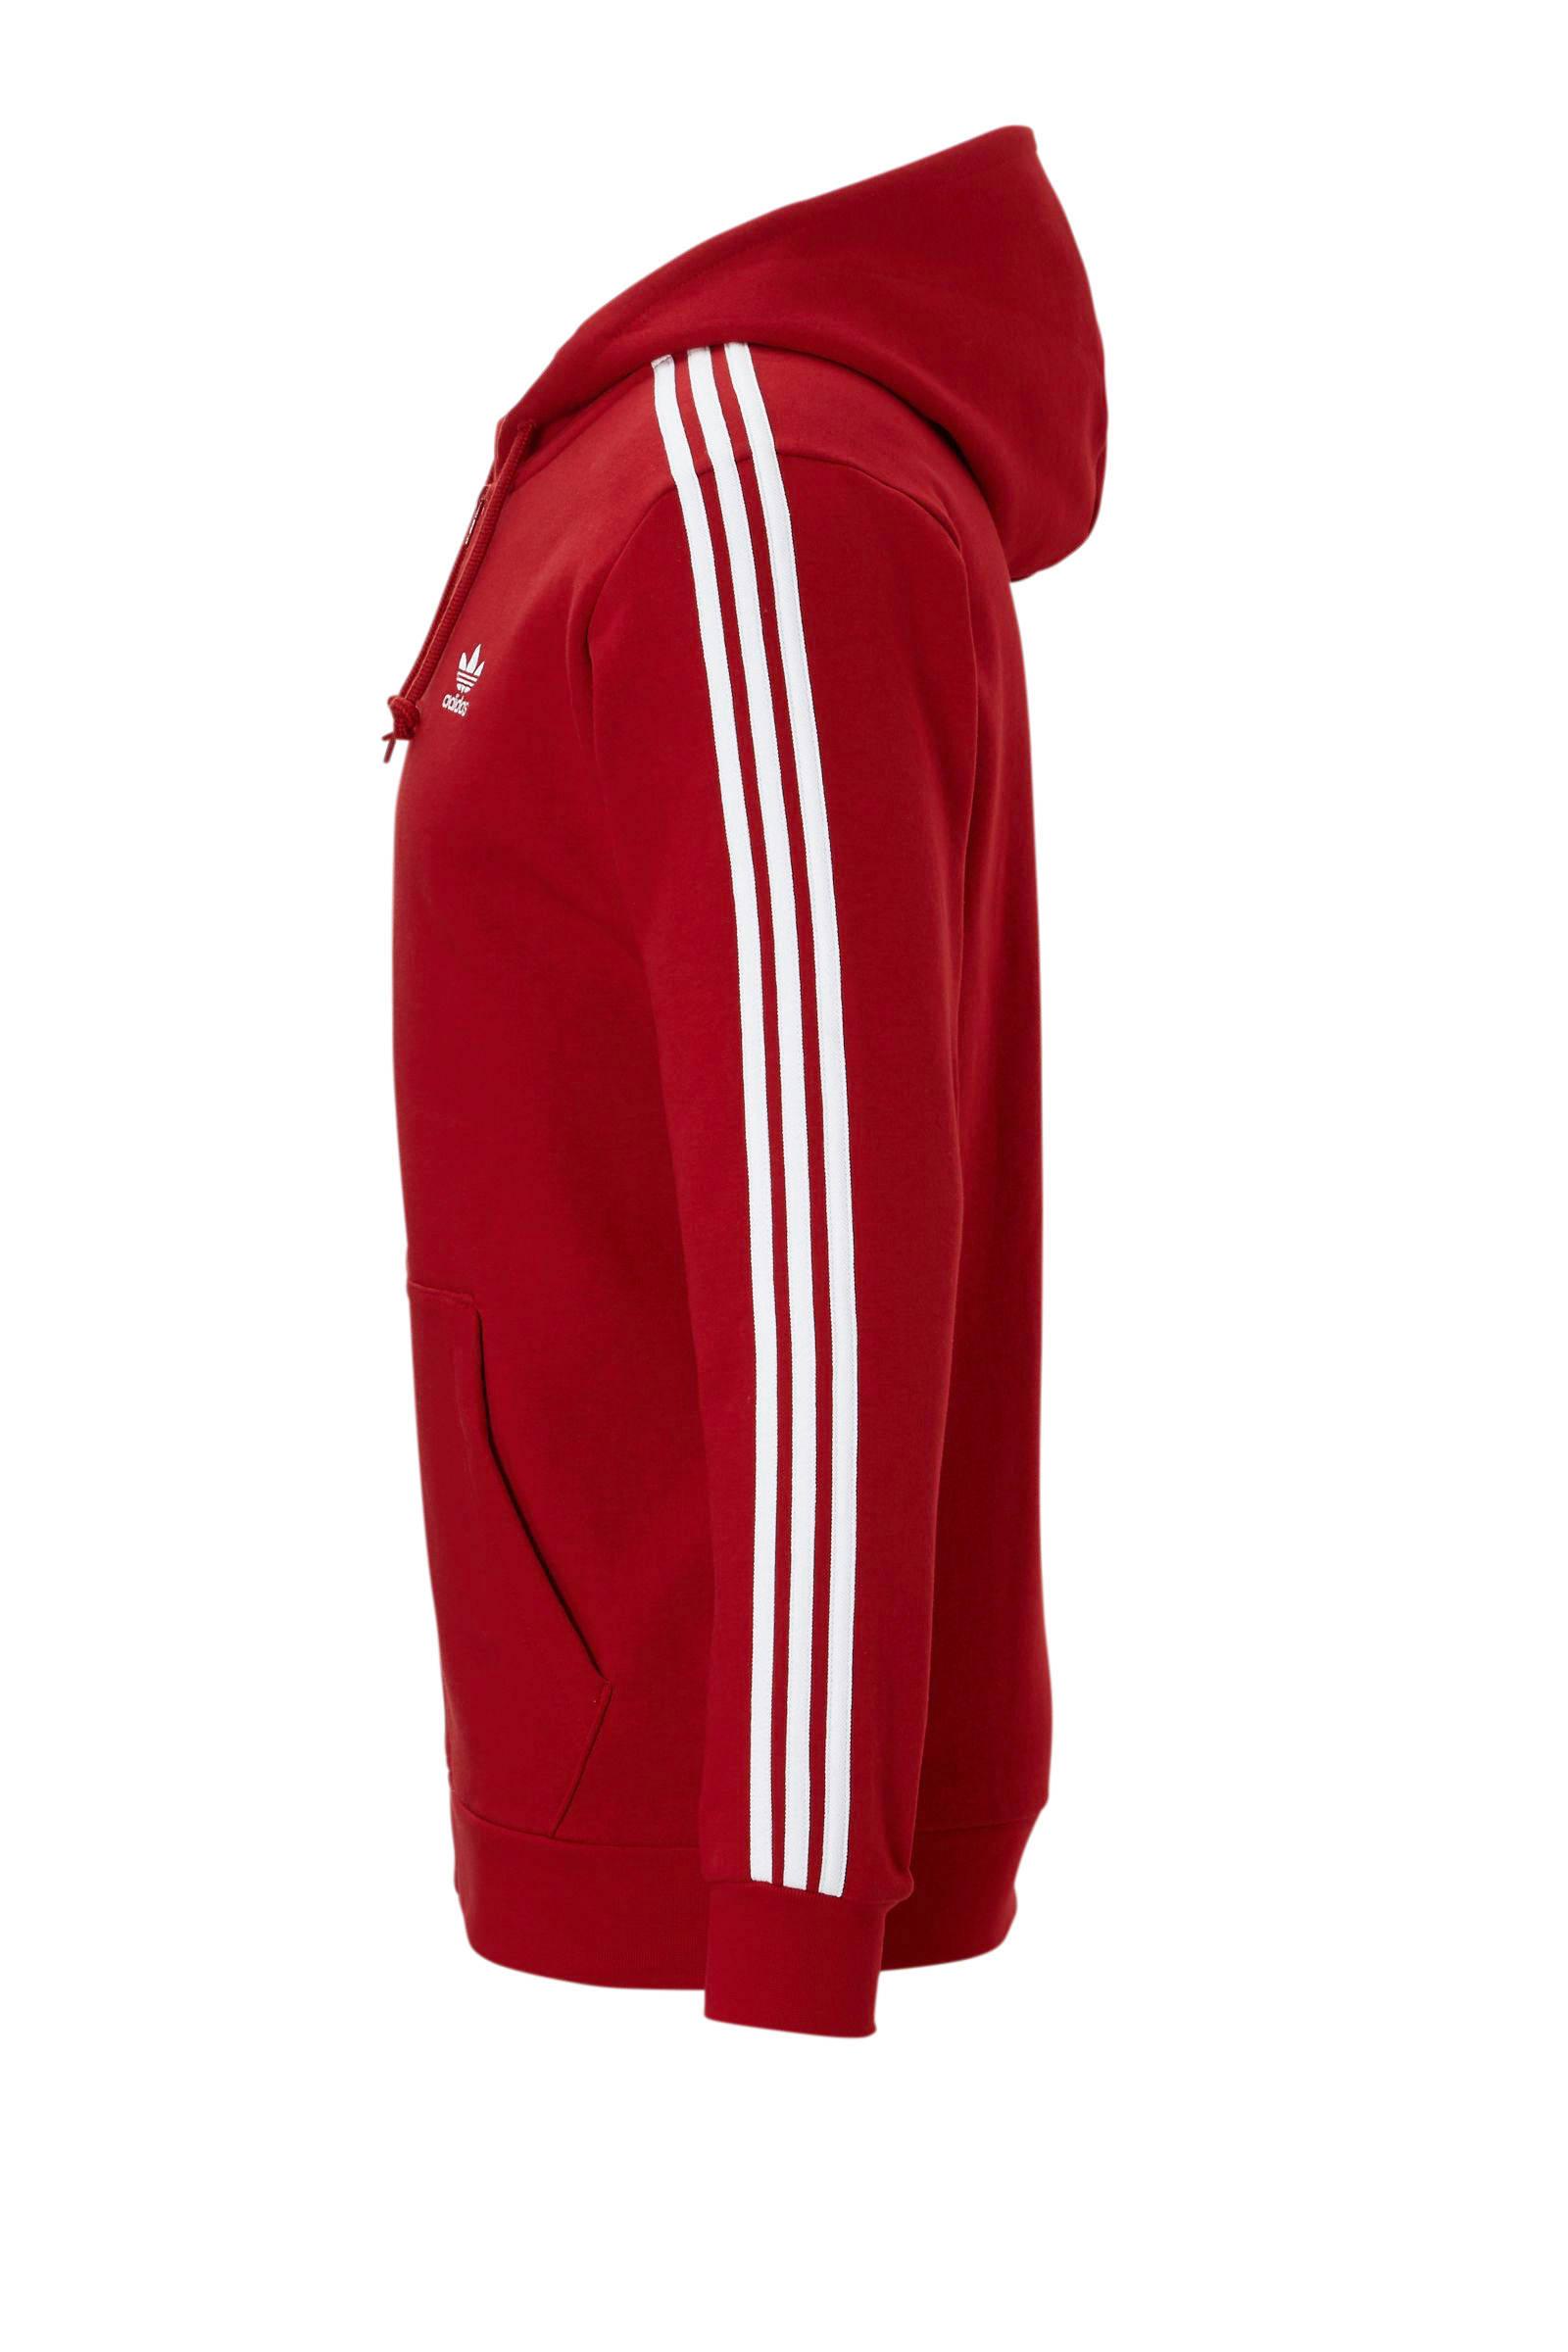 adidas Originals vest rood | wehkamp